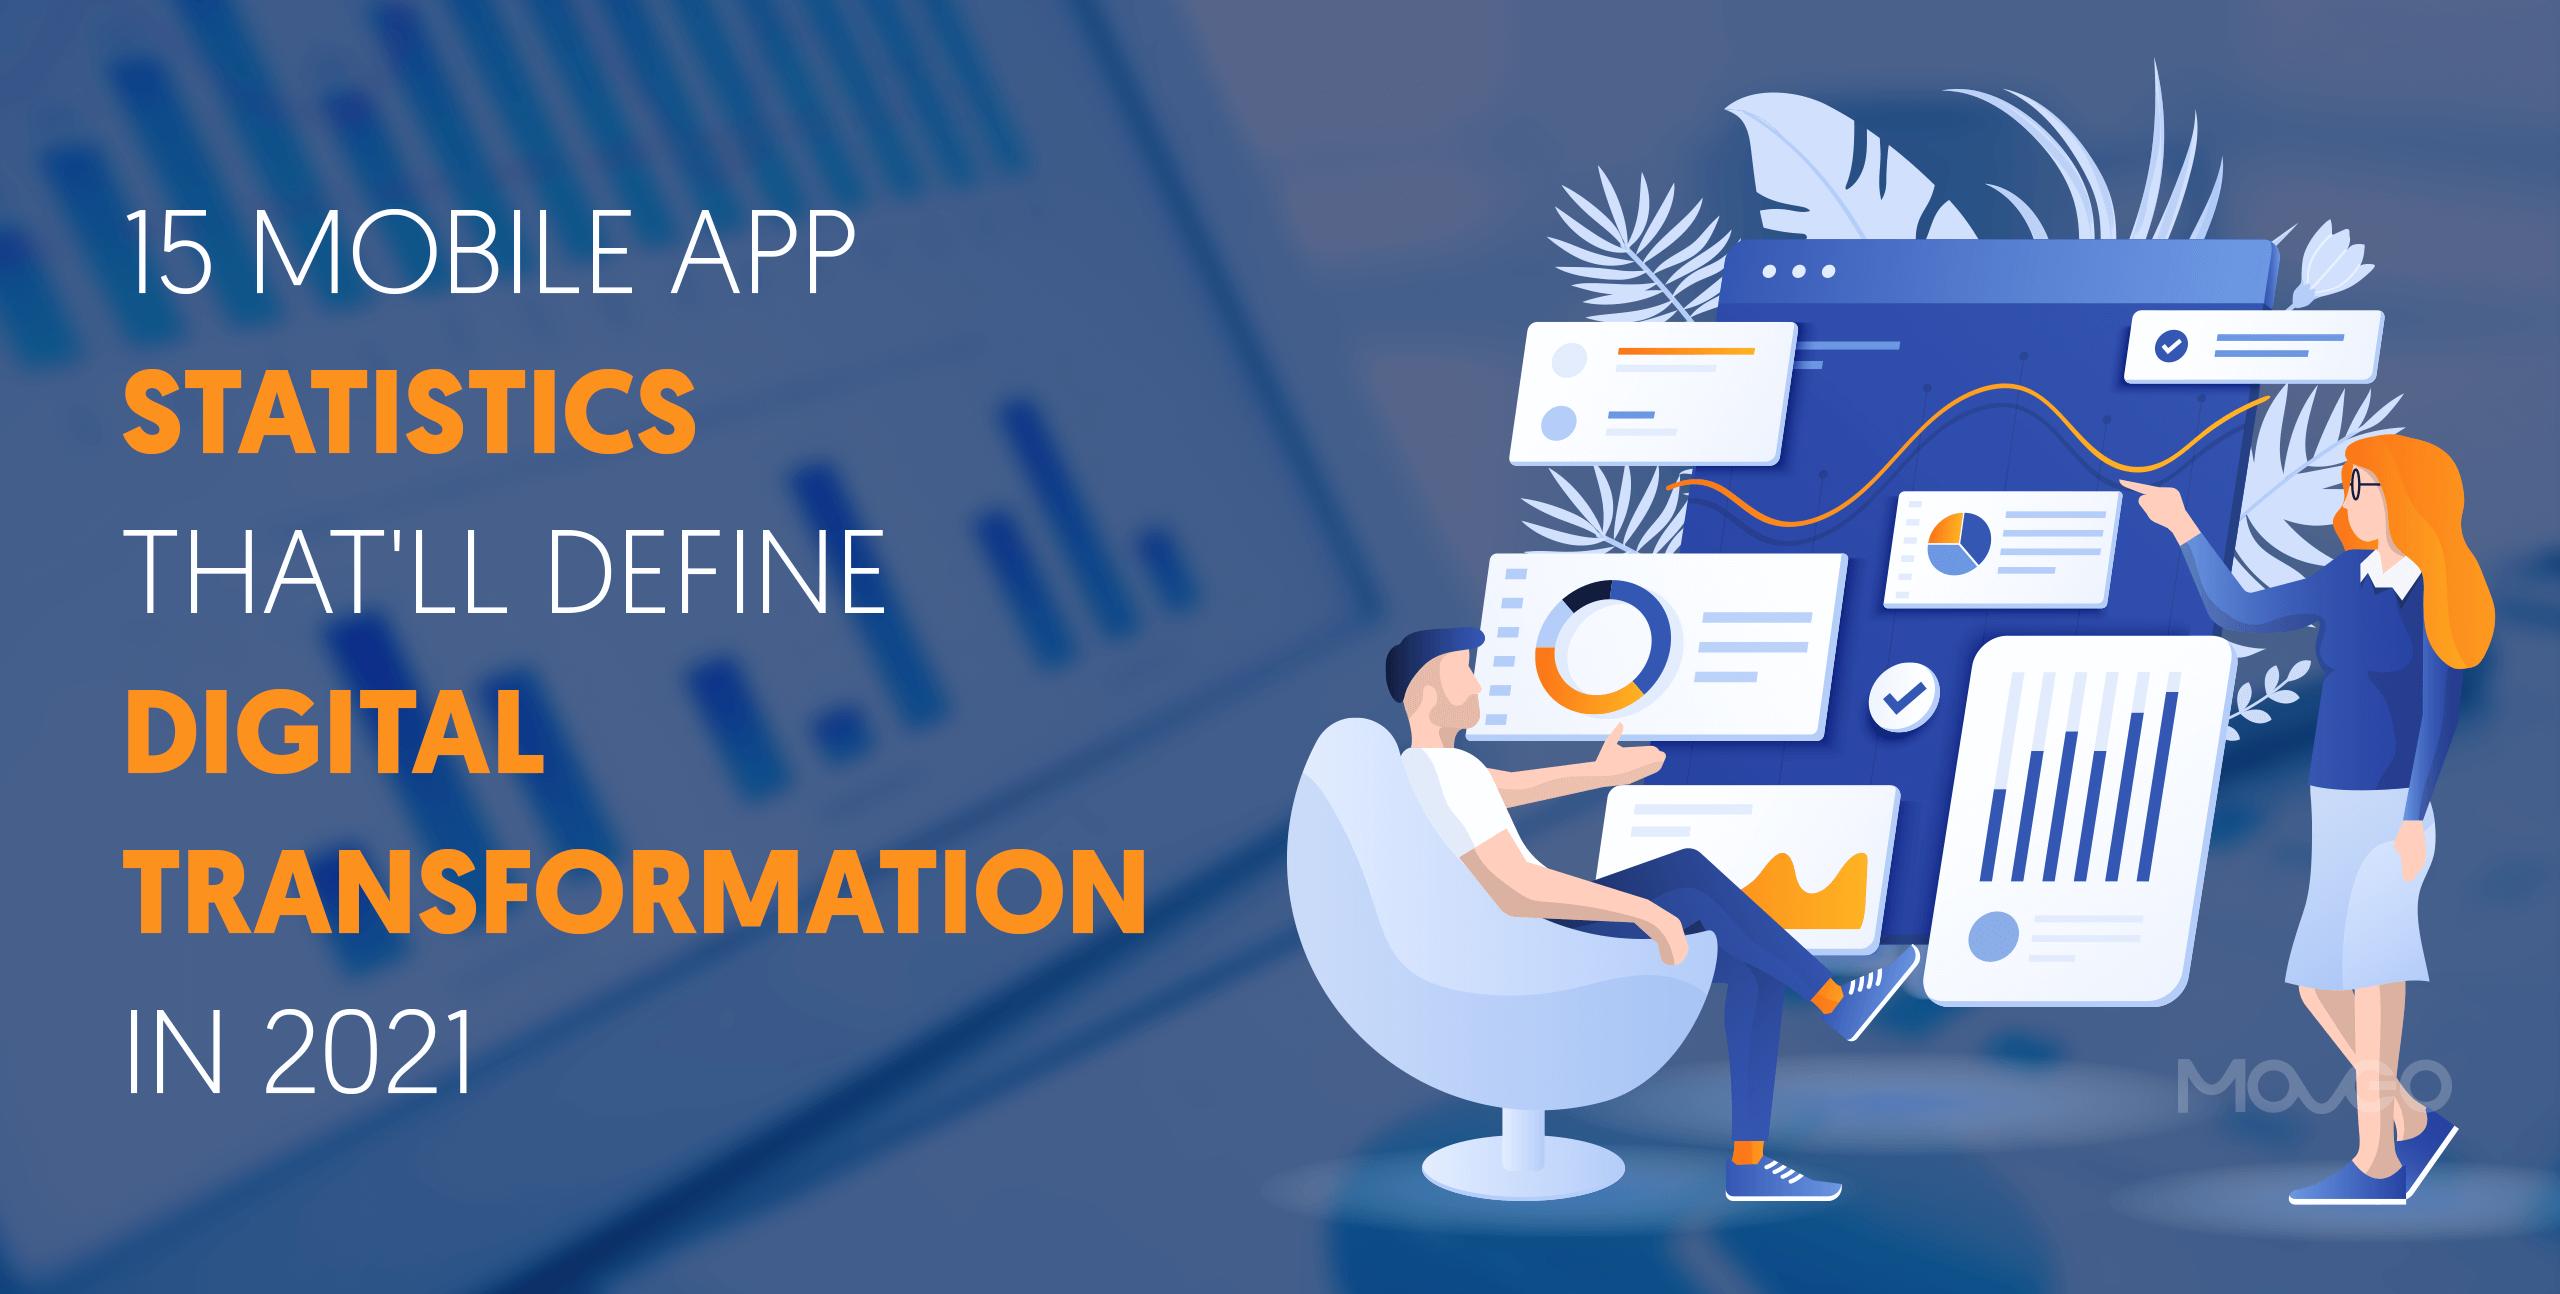 mobile app statistics